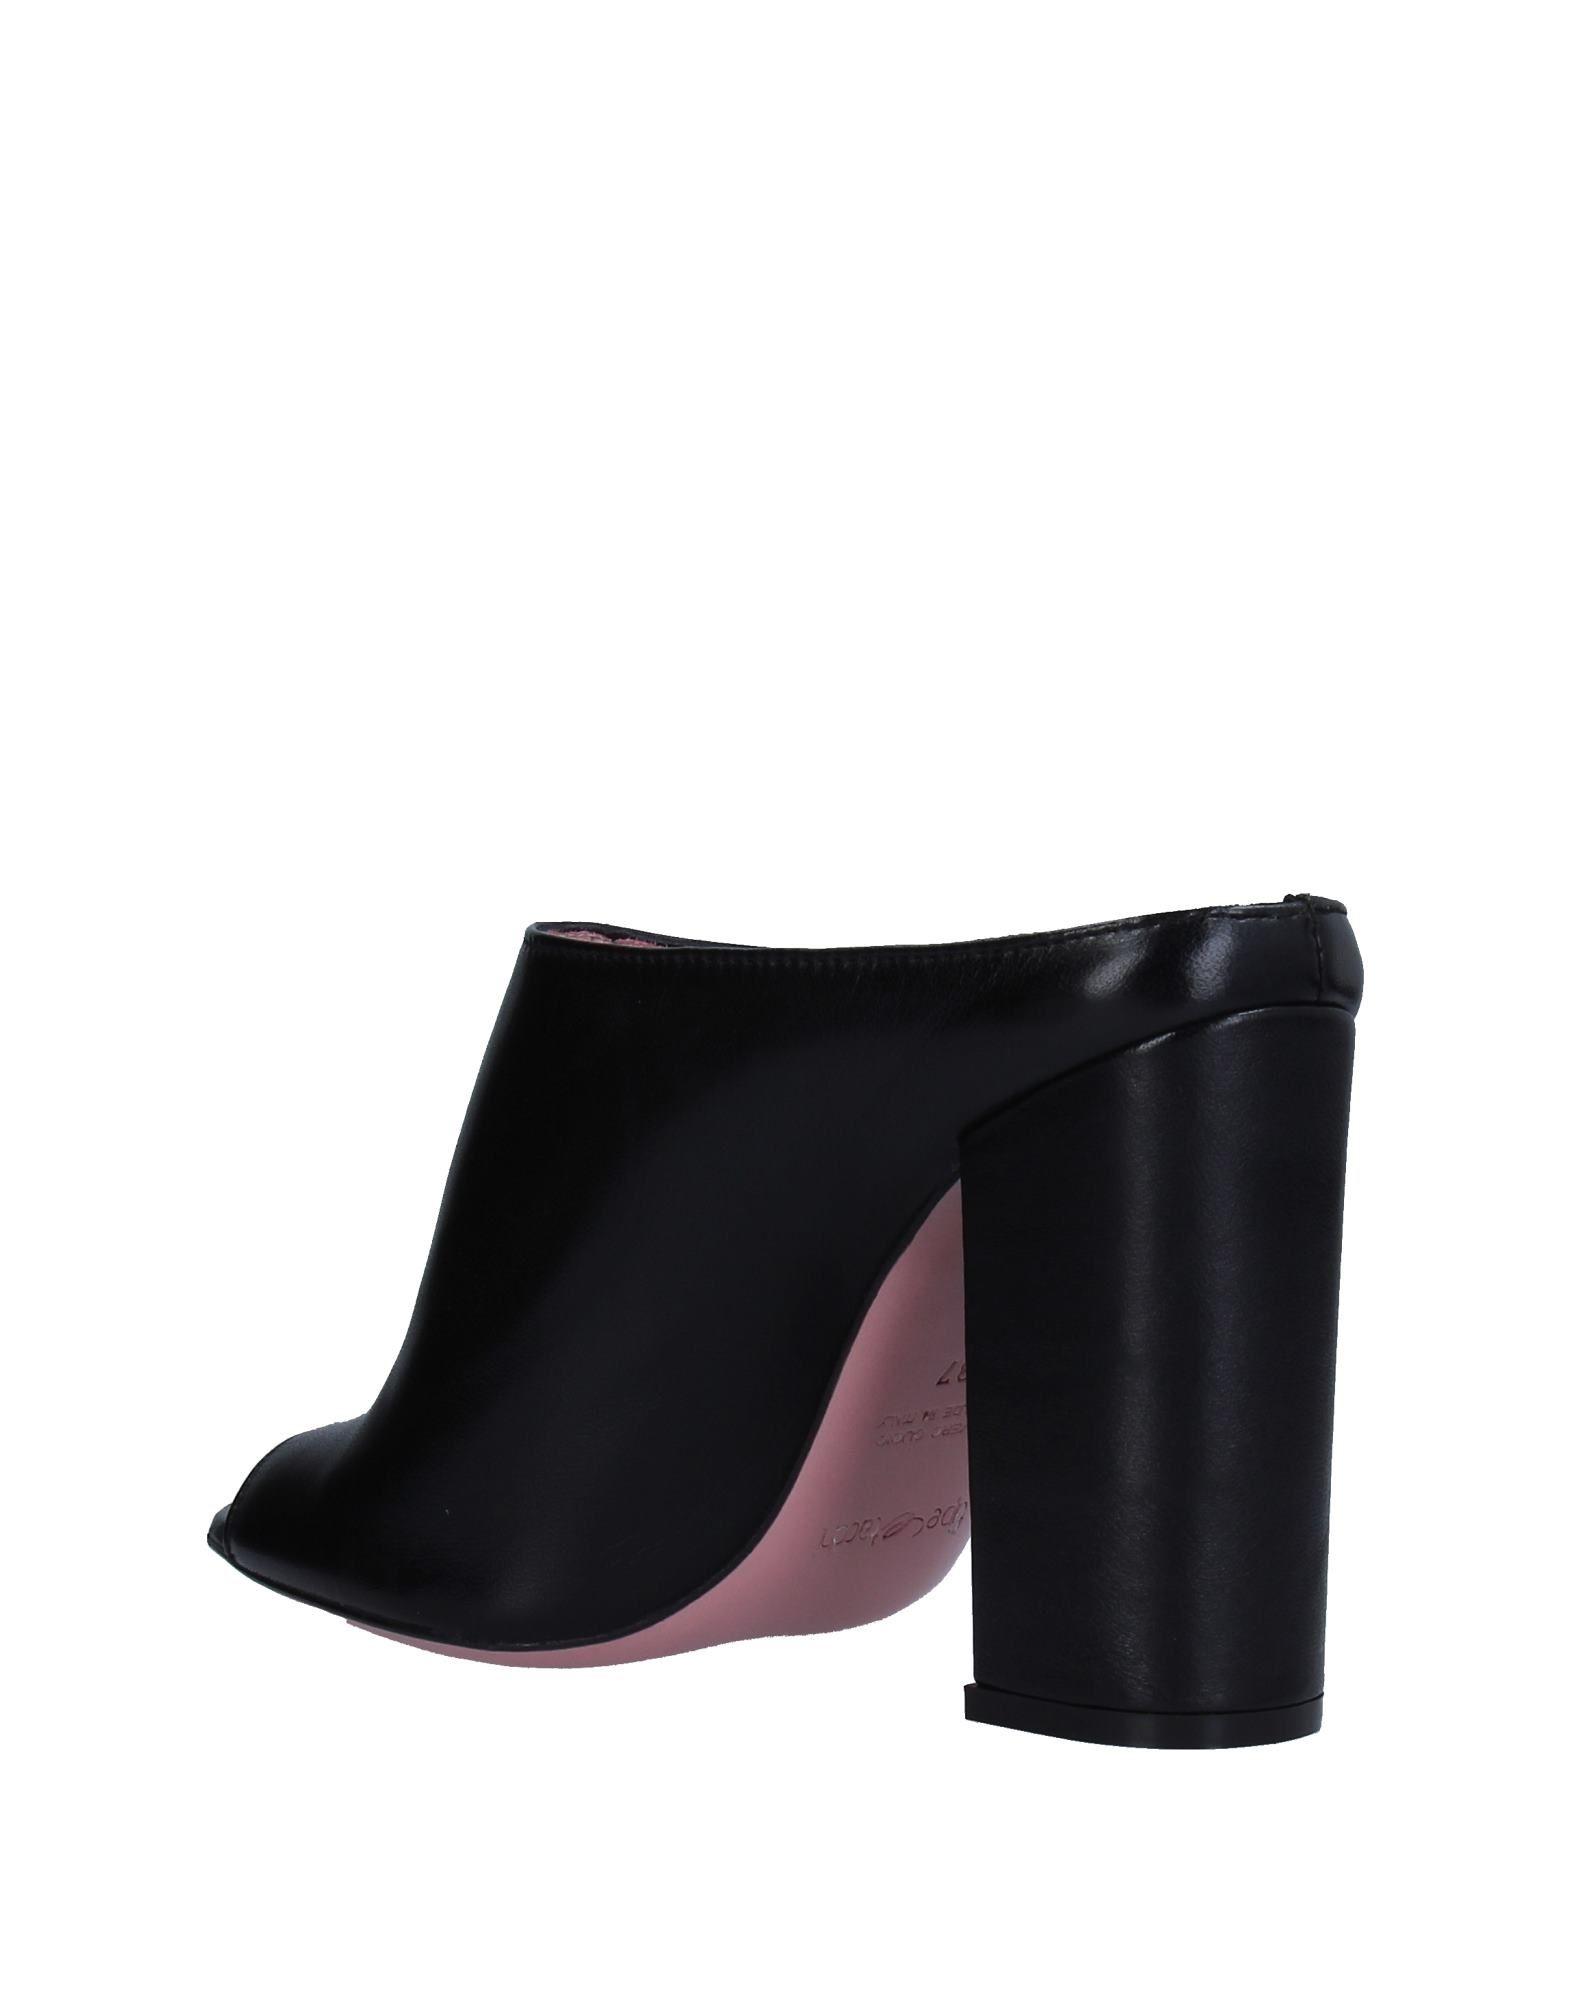 Tipe E Tacchi Neue Sandalen Damen  11332507MO Neue Tacchi Schuhe 8d0a74